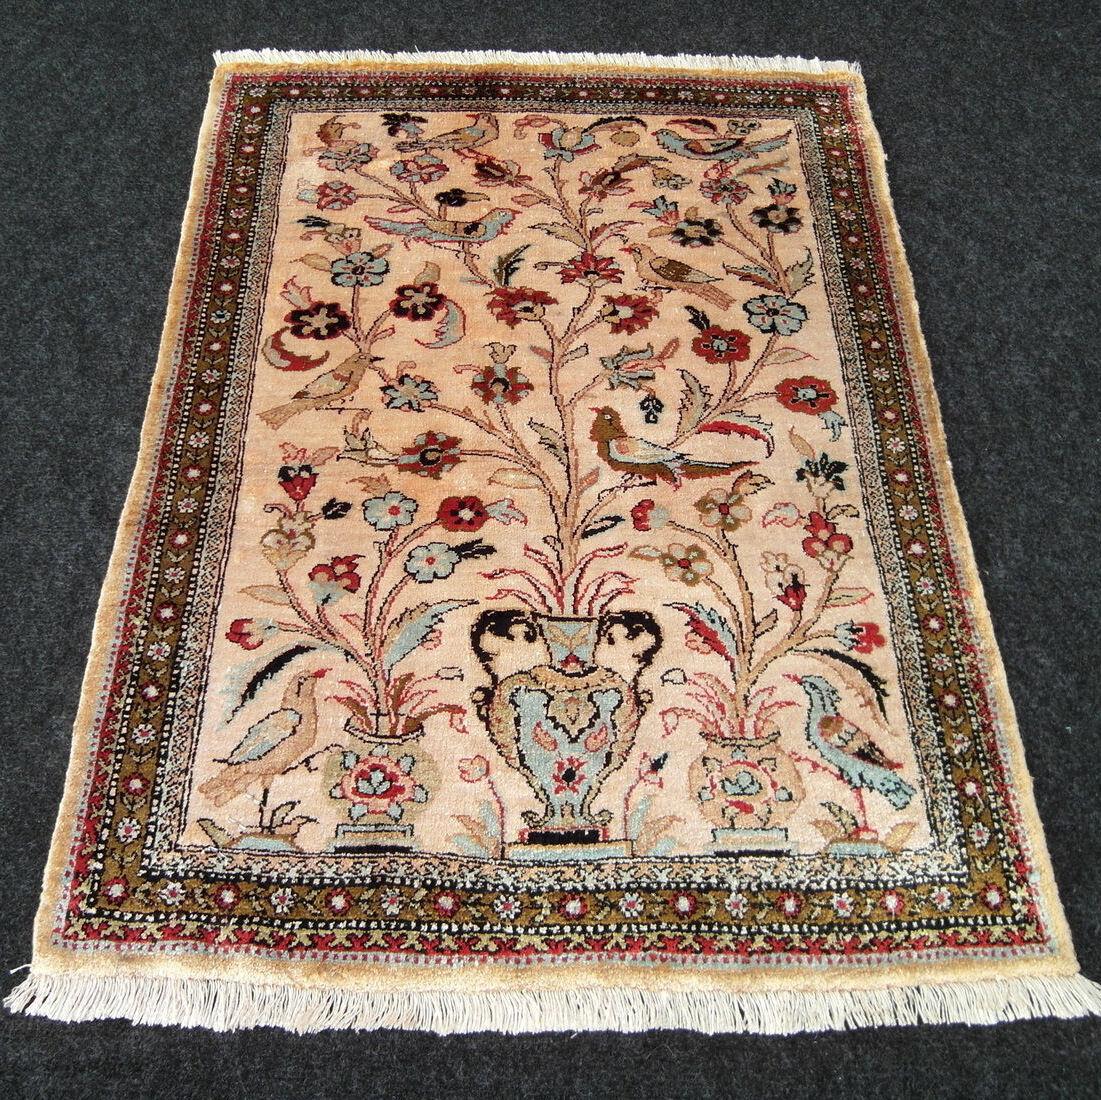 Orient alfombra seda 77 x 55 cm alfombra persa seidenteppich jarrón Silk Carpet Rug